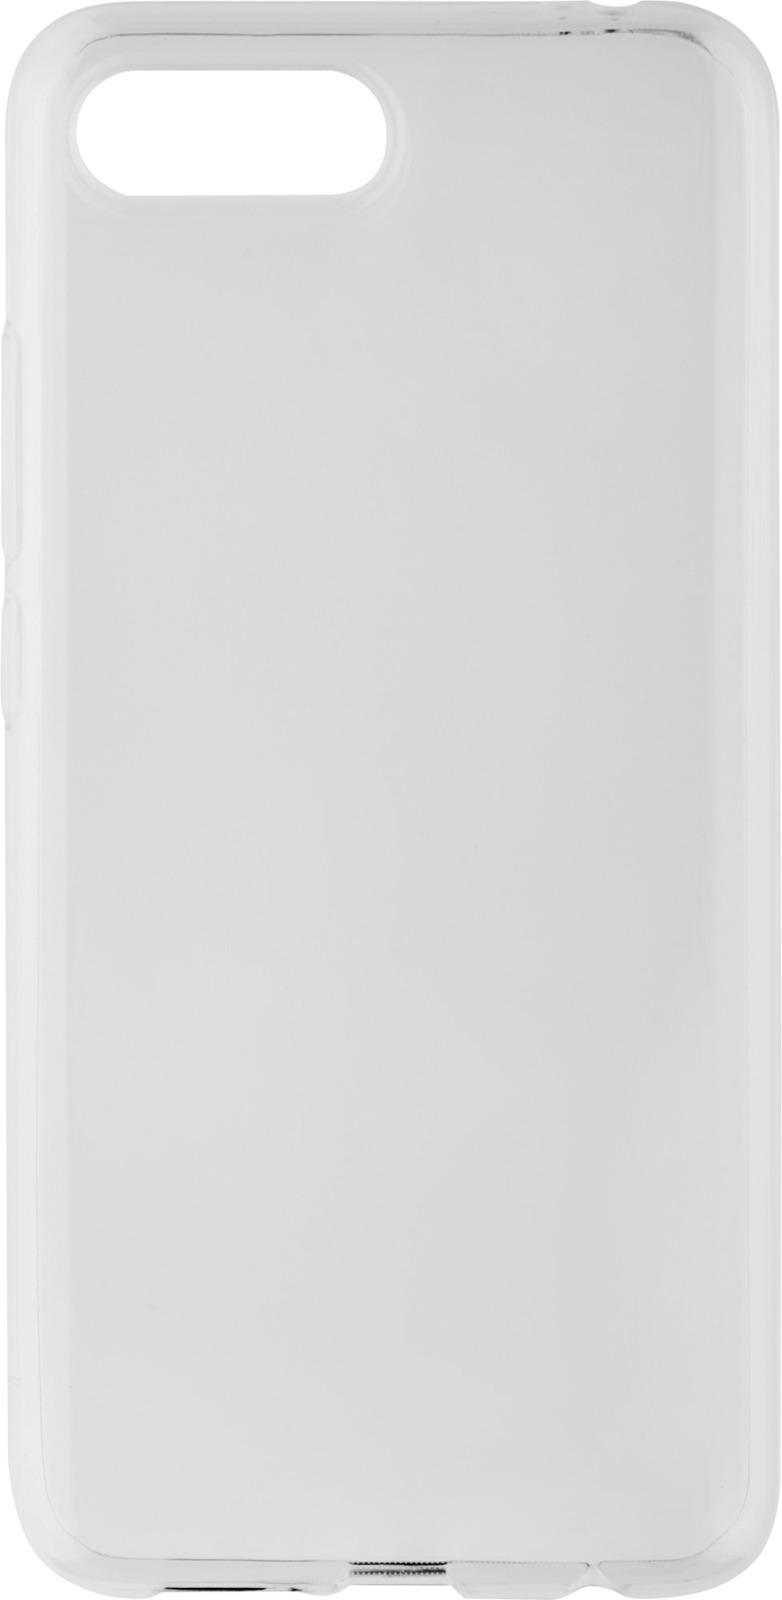 Чехол клип-кейс Interstep Is Slender для Huawei Honor 10, прозрачный цена и фото